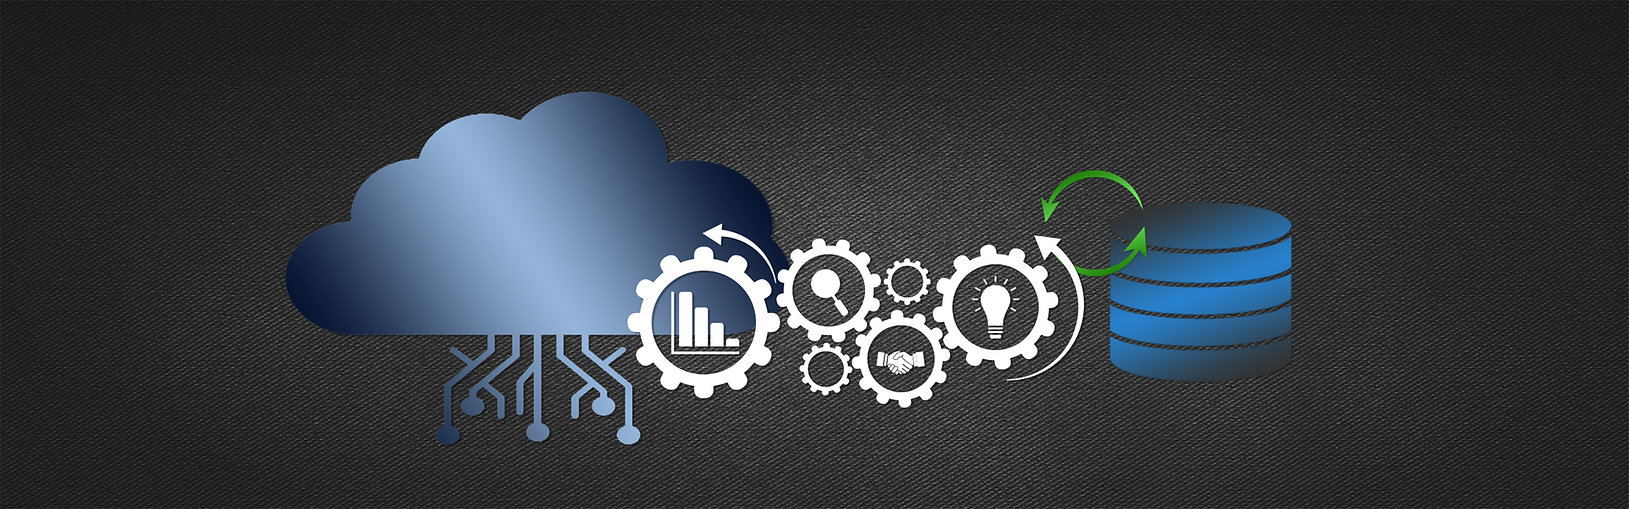 CloudAppDBDevService.jpg